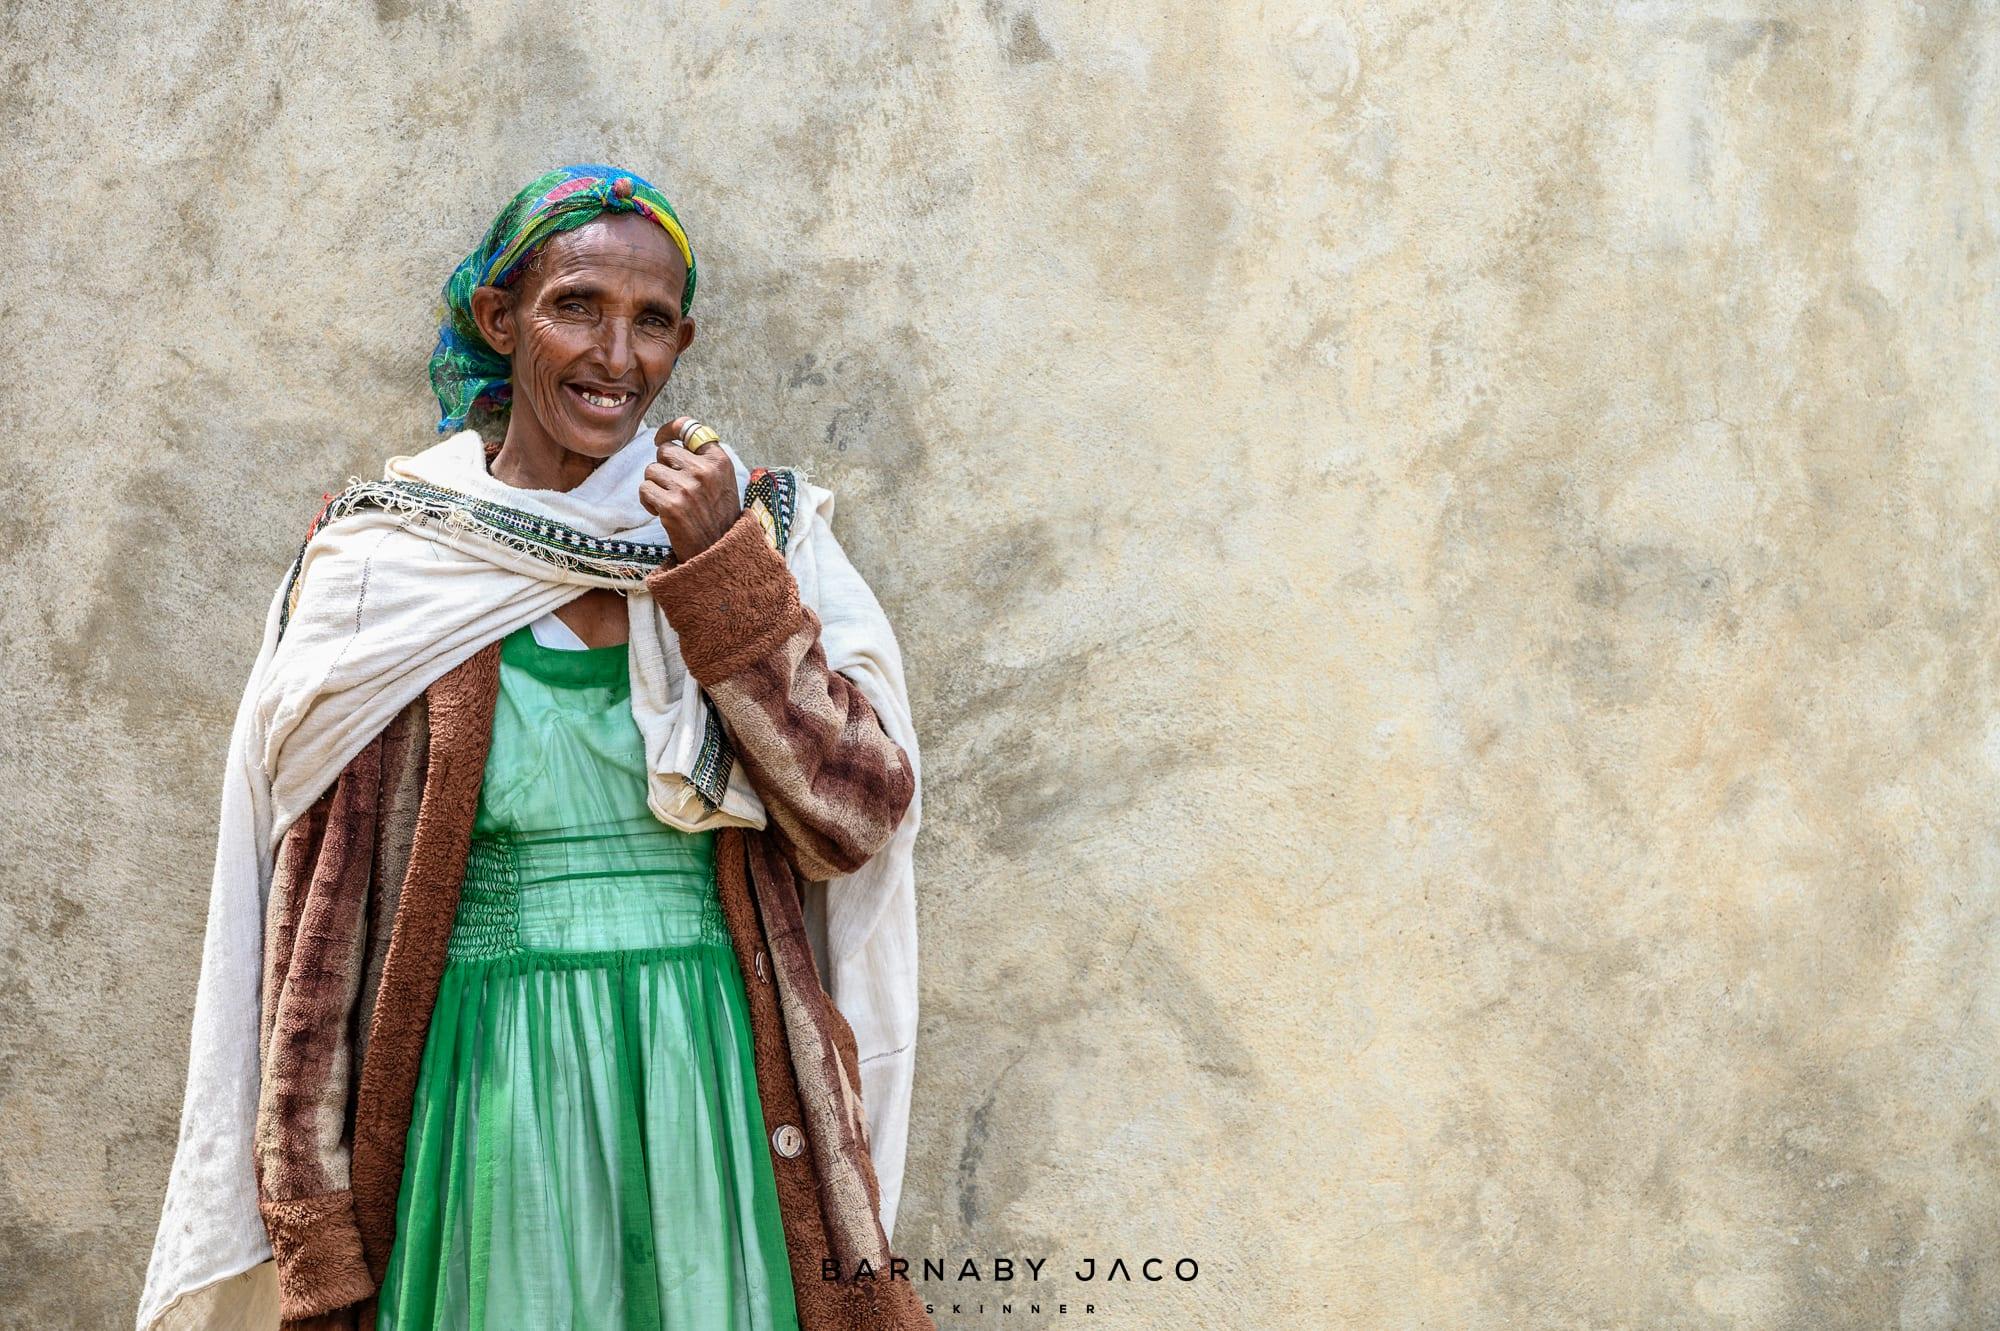 Imaging aid programmes across Ethiopia's Tigray region